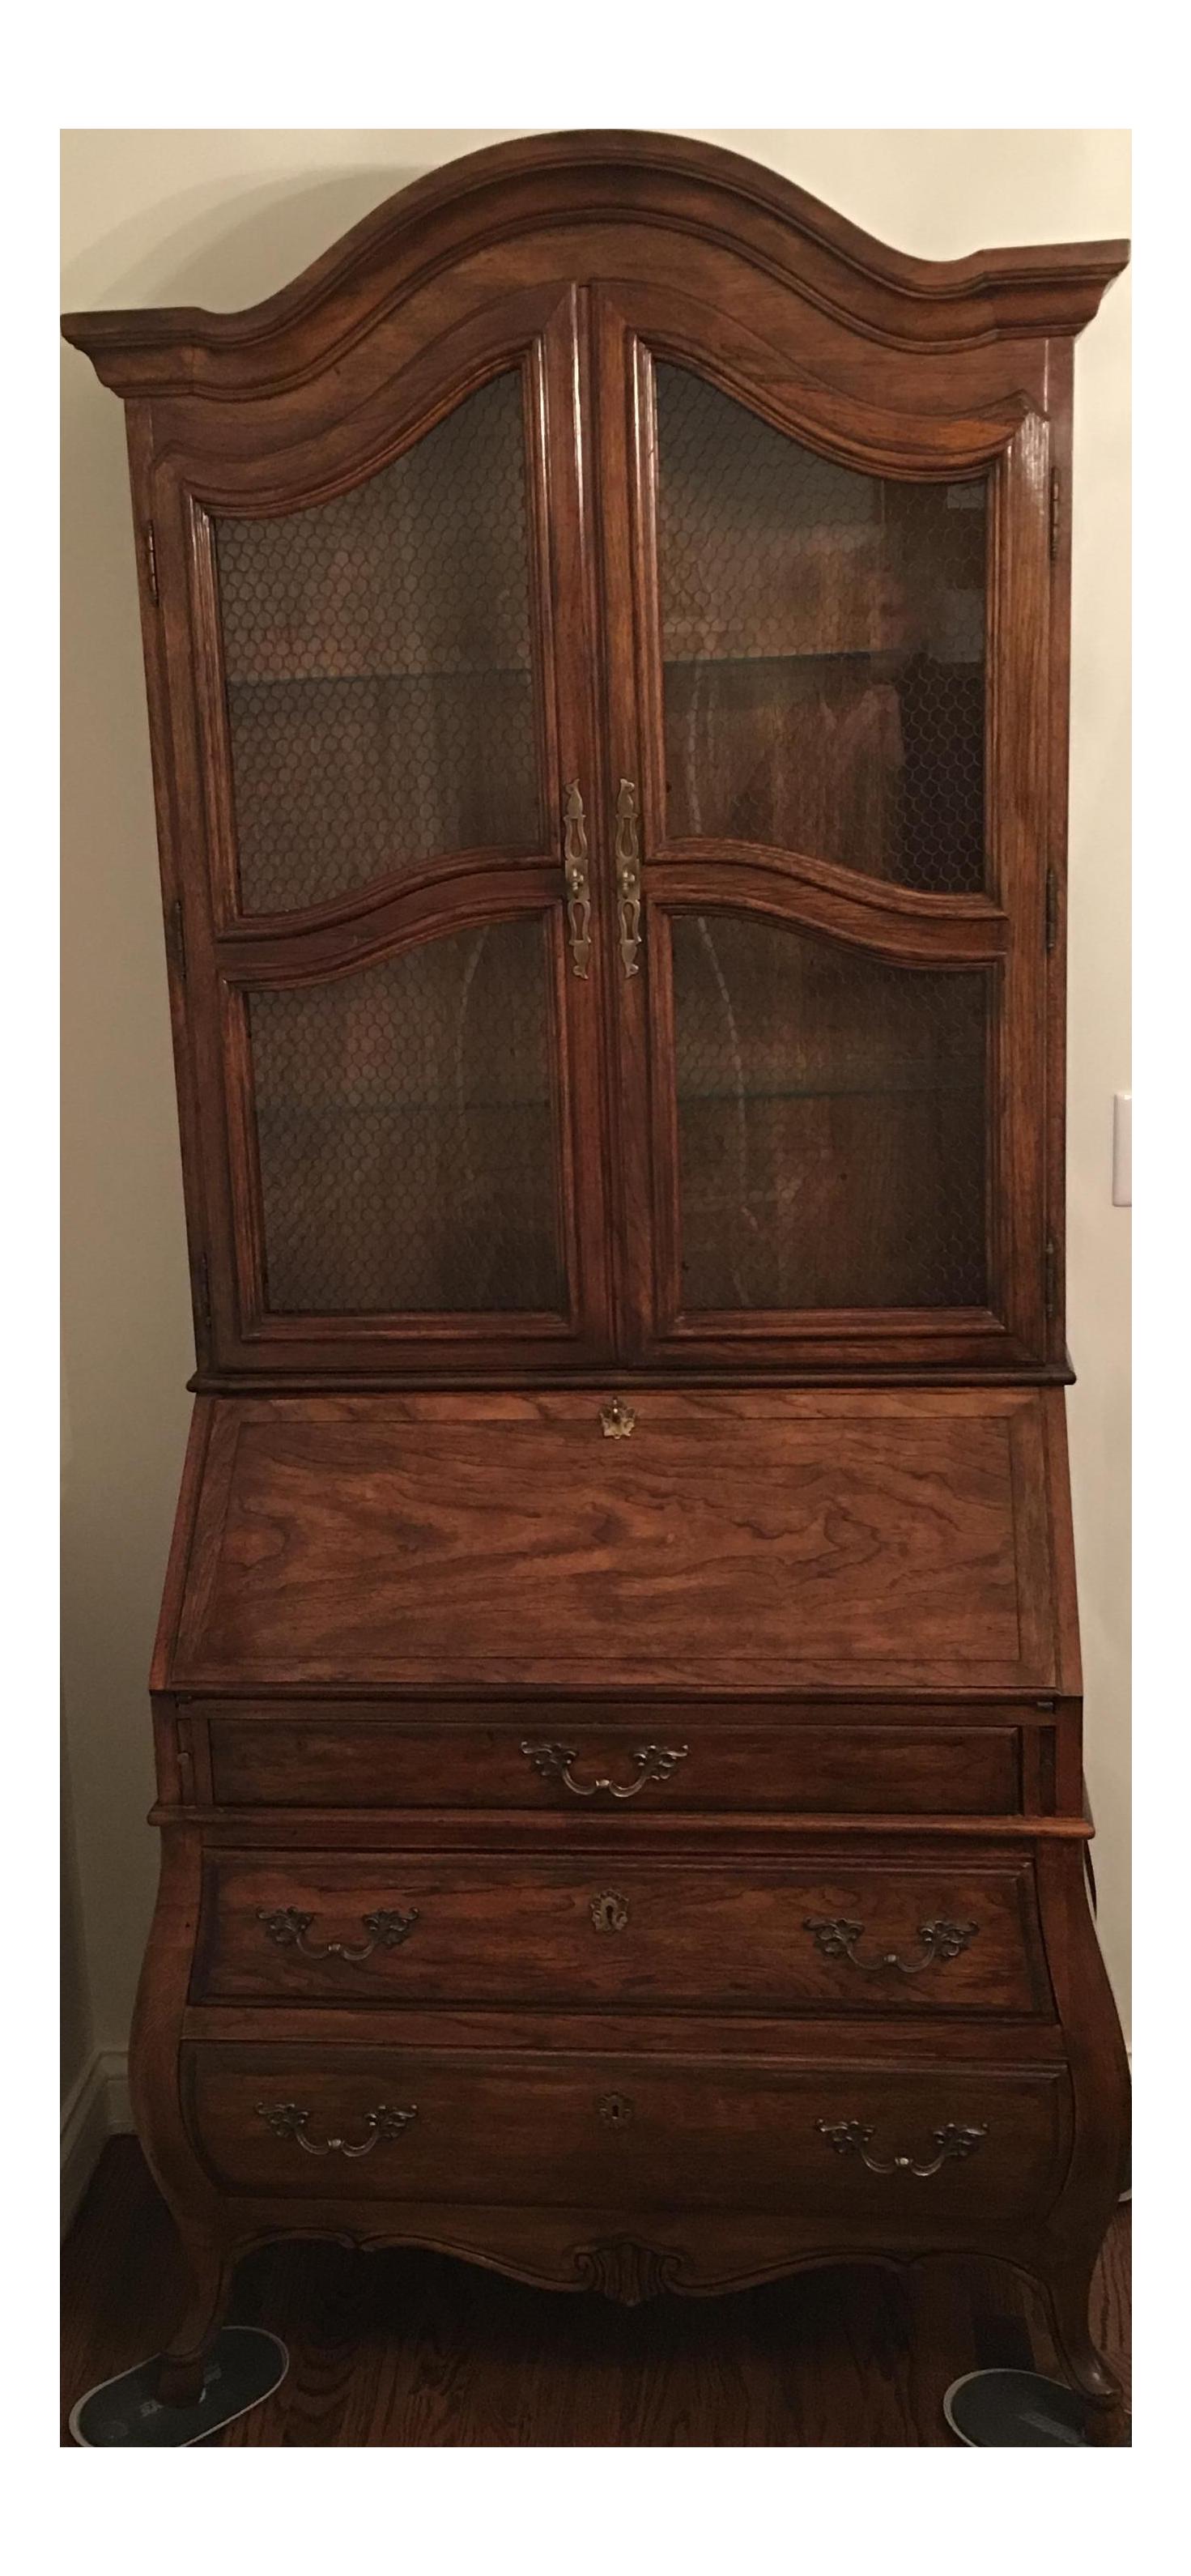 Vintage Drexel Secretary Desk Bookcase Chairish